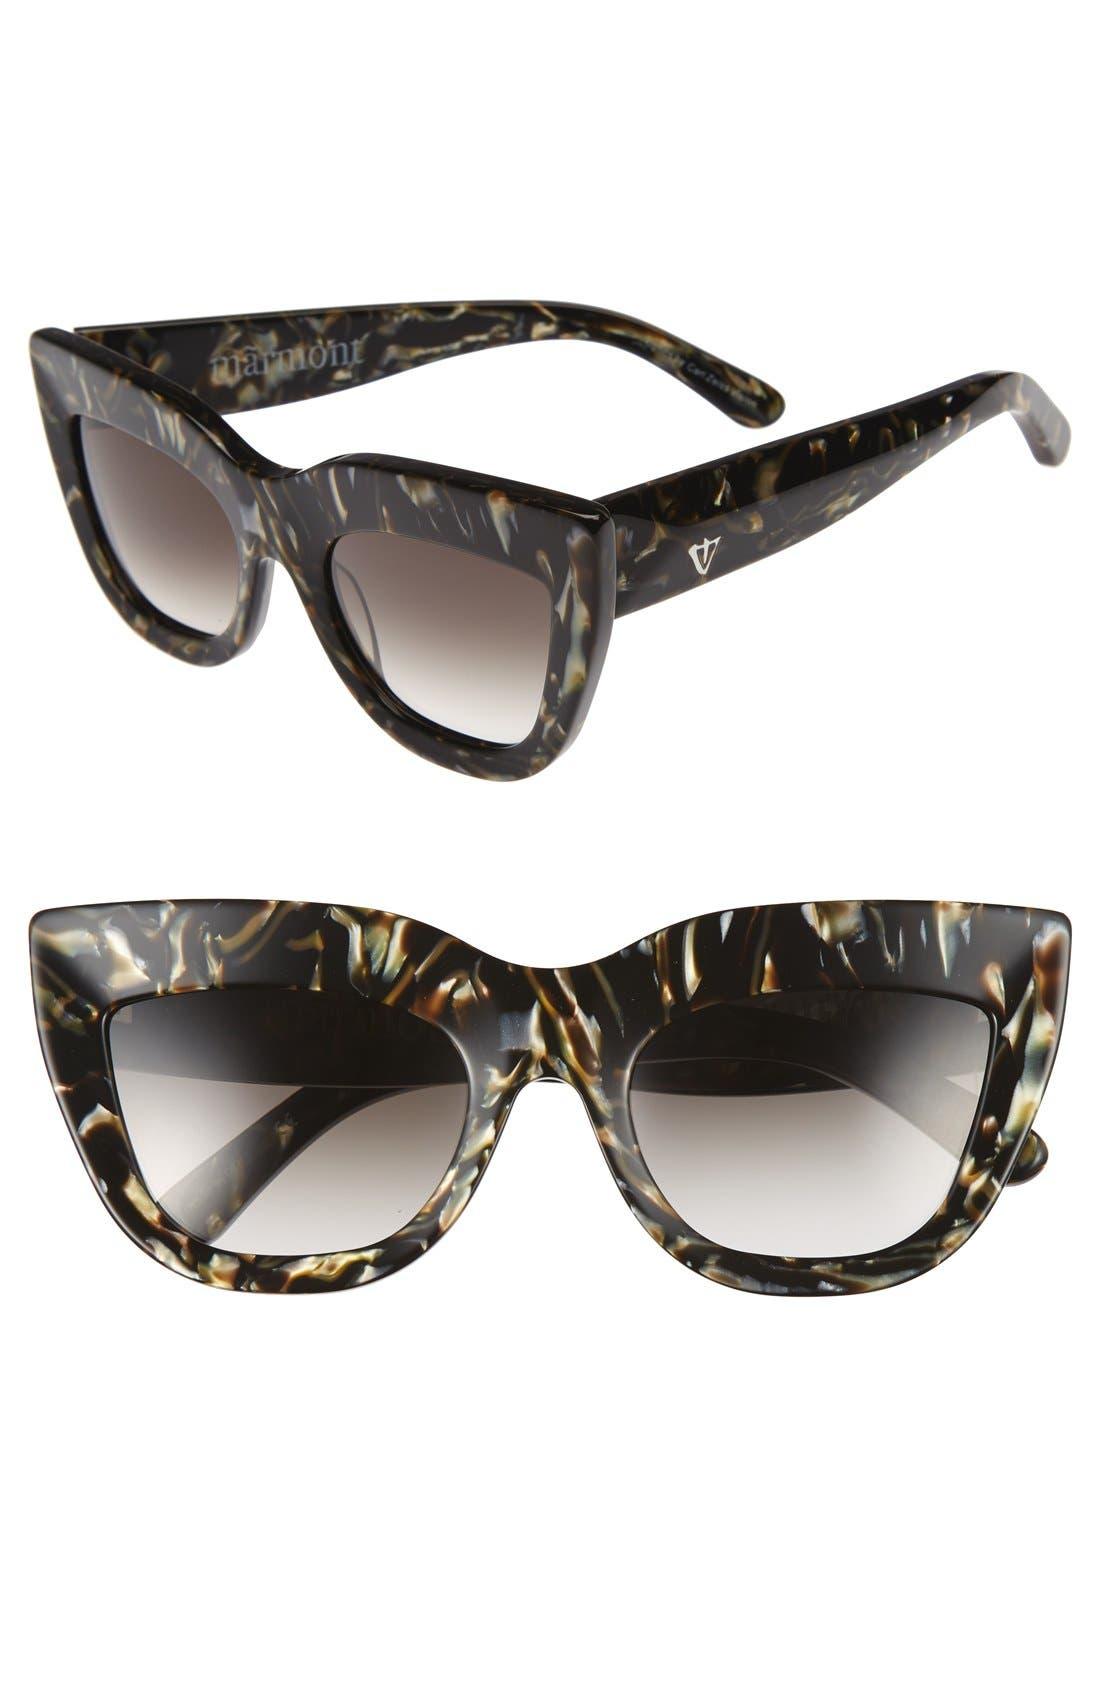 Main Image - VALLEY Marmont 52mm Cat Eye Sunglasses